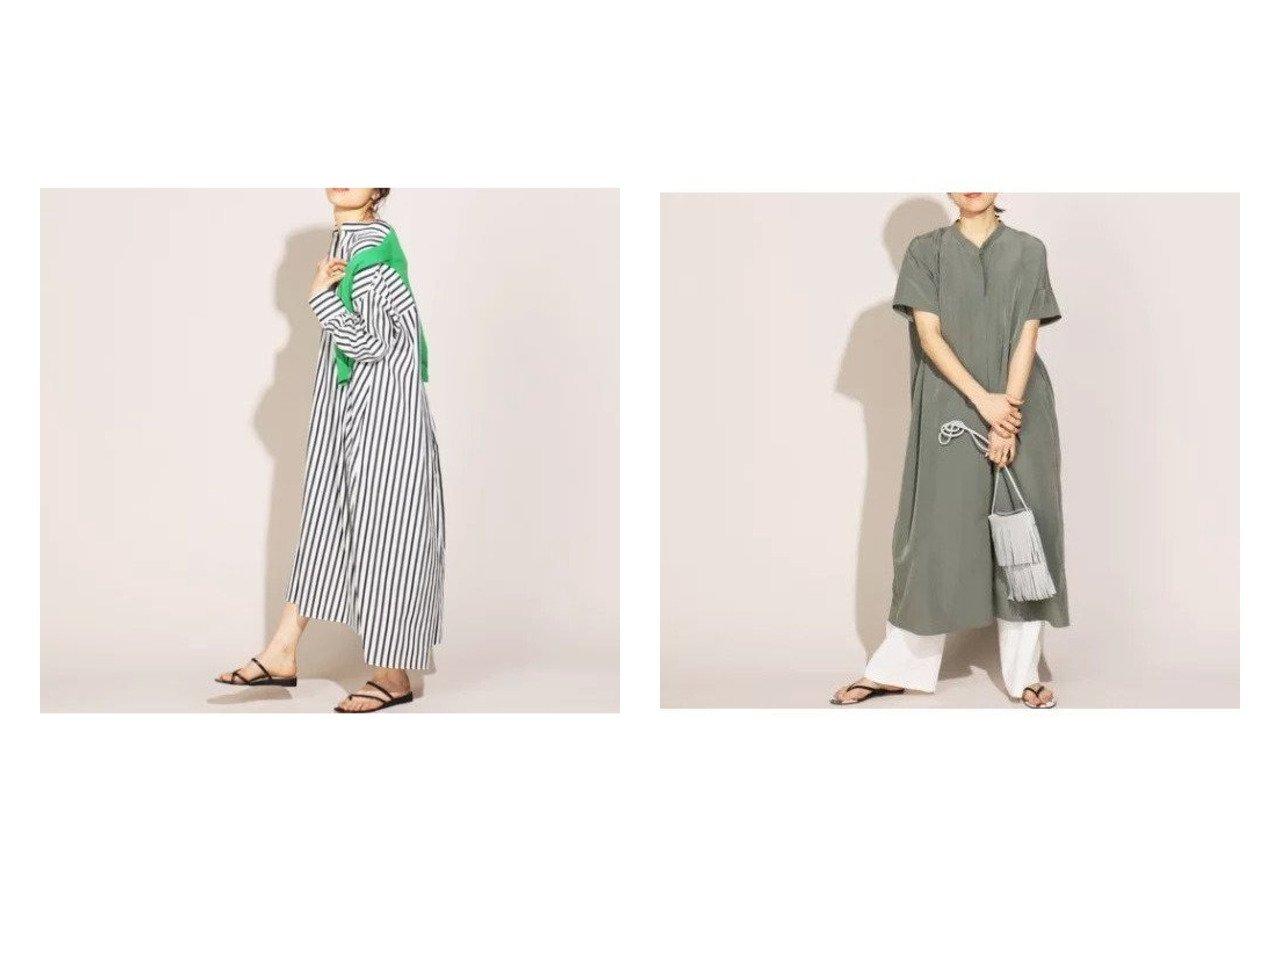 【NOLLEY'S/ノーリーズ】のヴィンテージファイユボリュームワンピース&【WEB限定】ストライプシャツワンピース 【ワンピース・ドレス】おすすめ!人気、トレンド・レディースファッションの通販 おすすめで人気の流行・トレンド、ファッションの通販商品 メンズファッション・キッズファッション・インテリア・家具・レディースファッション・服の通販 founy(ファニー) https://founy.com/ ファッション Fashion レディースファッション WOMEN ワンピース Dress シャツワンピース Shirt Dresses インナー マキシ 半袖 長袖  ID:crp329100000029338